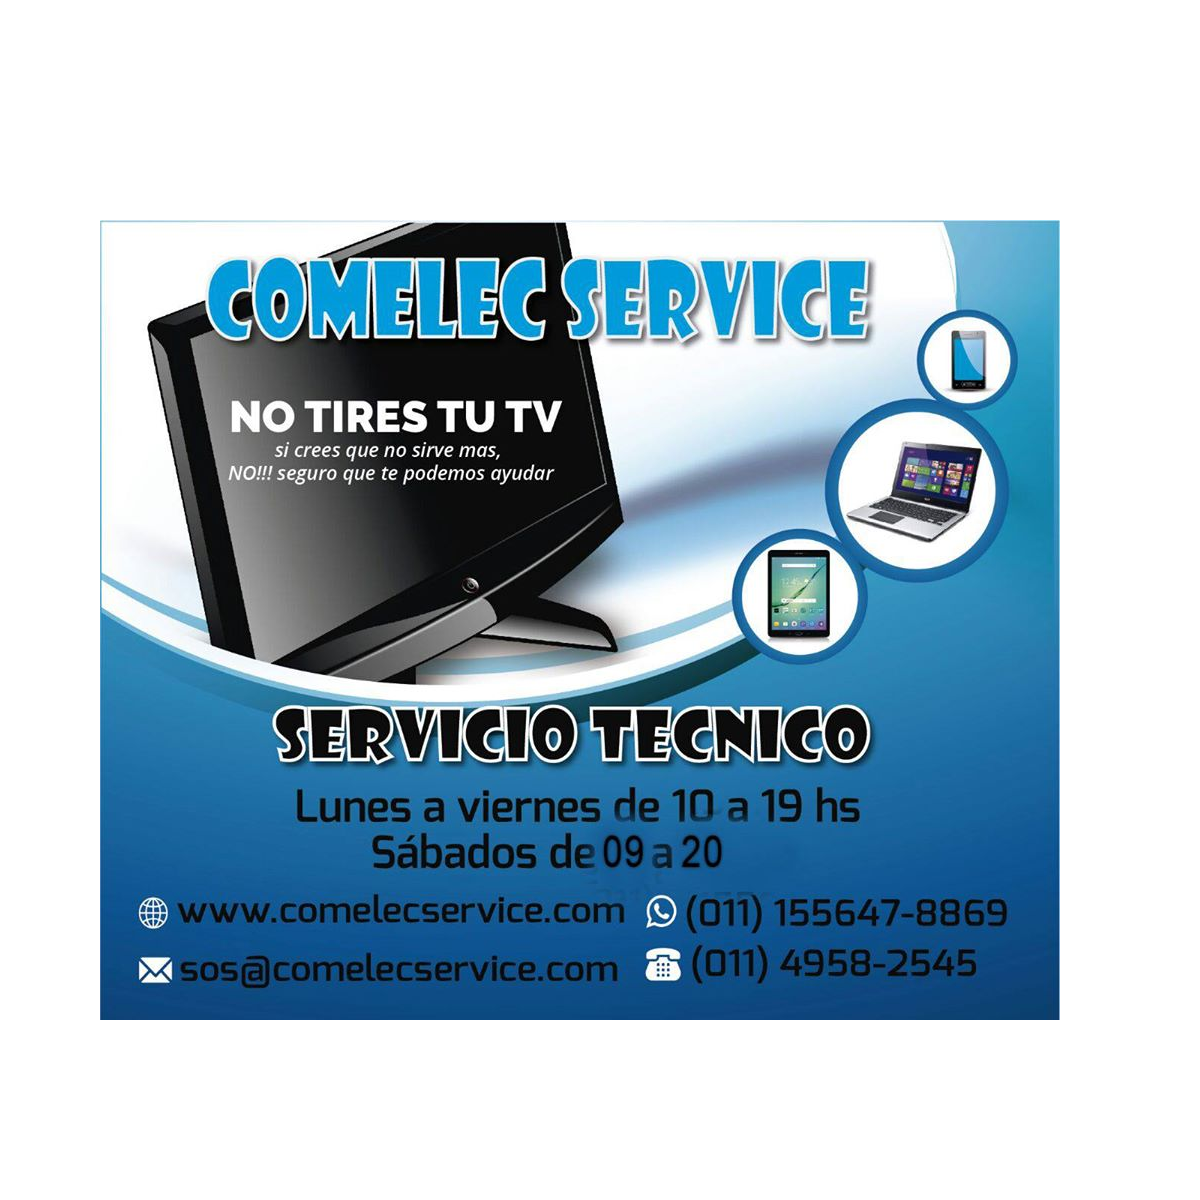 COMELEC SERVICE - SERVICE DE TV